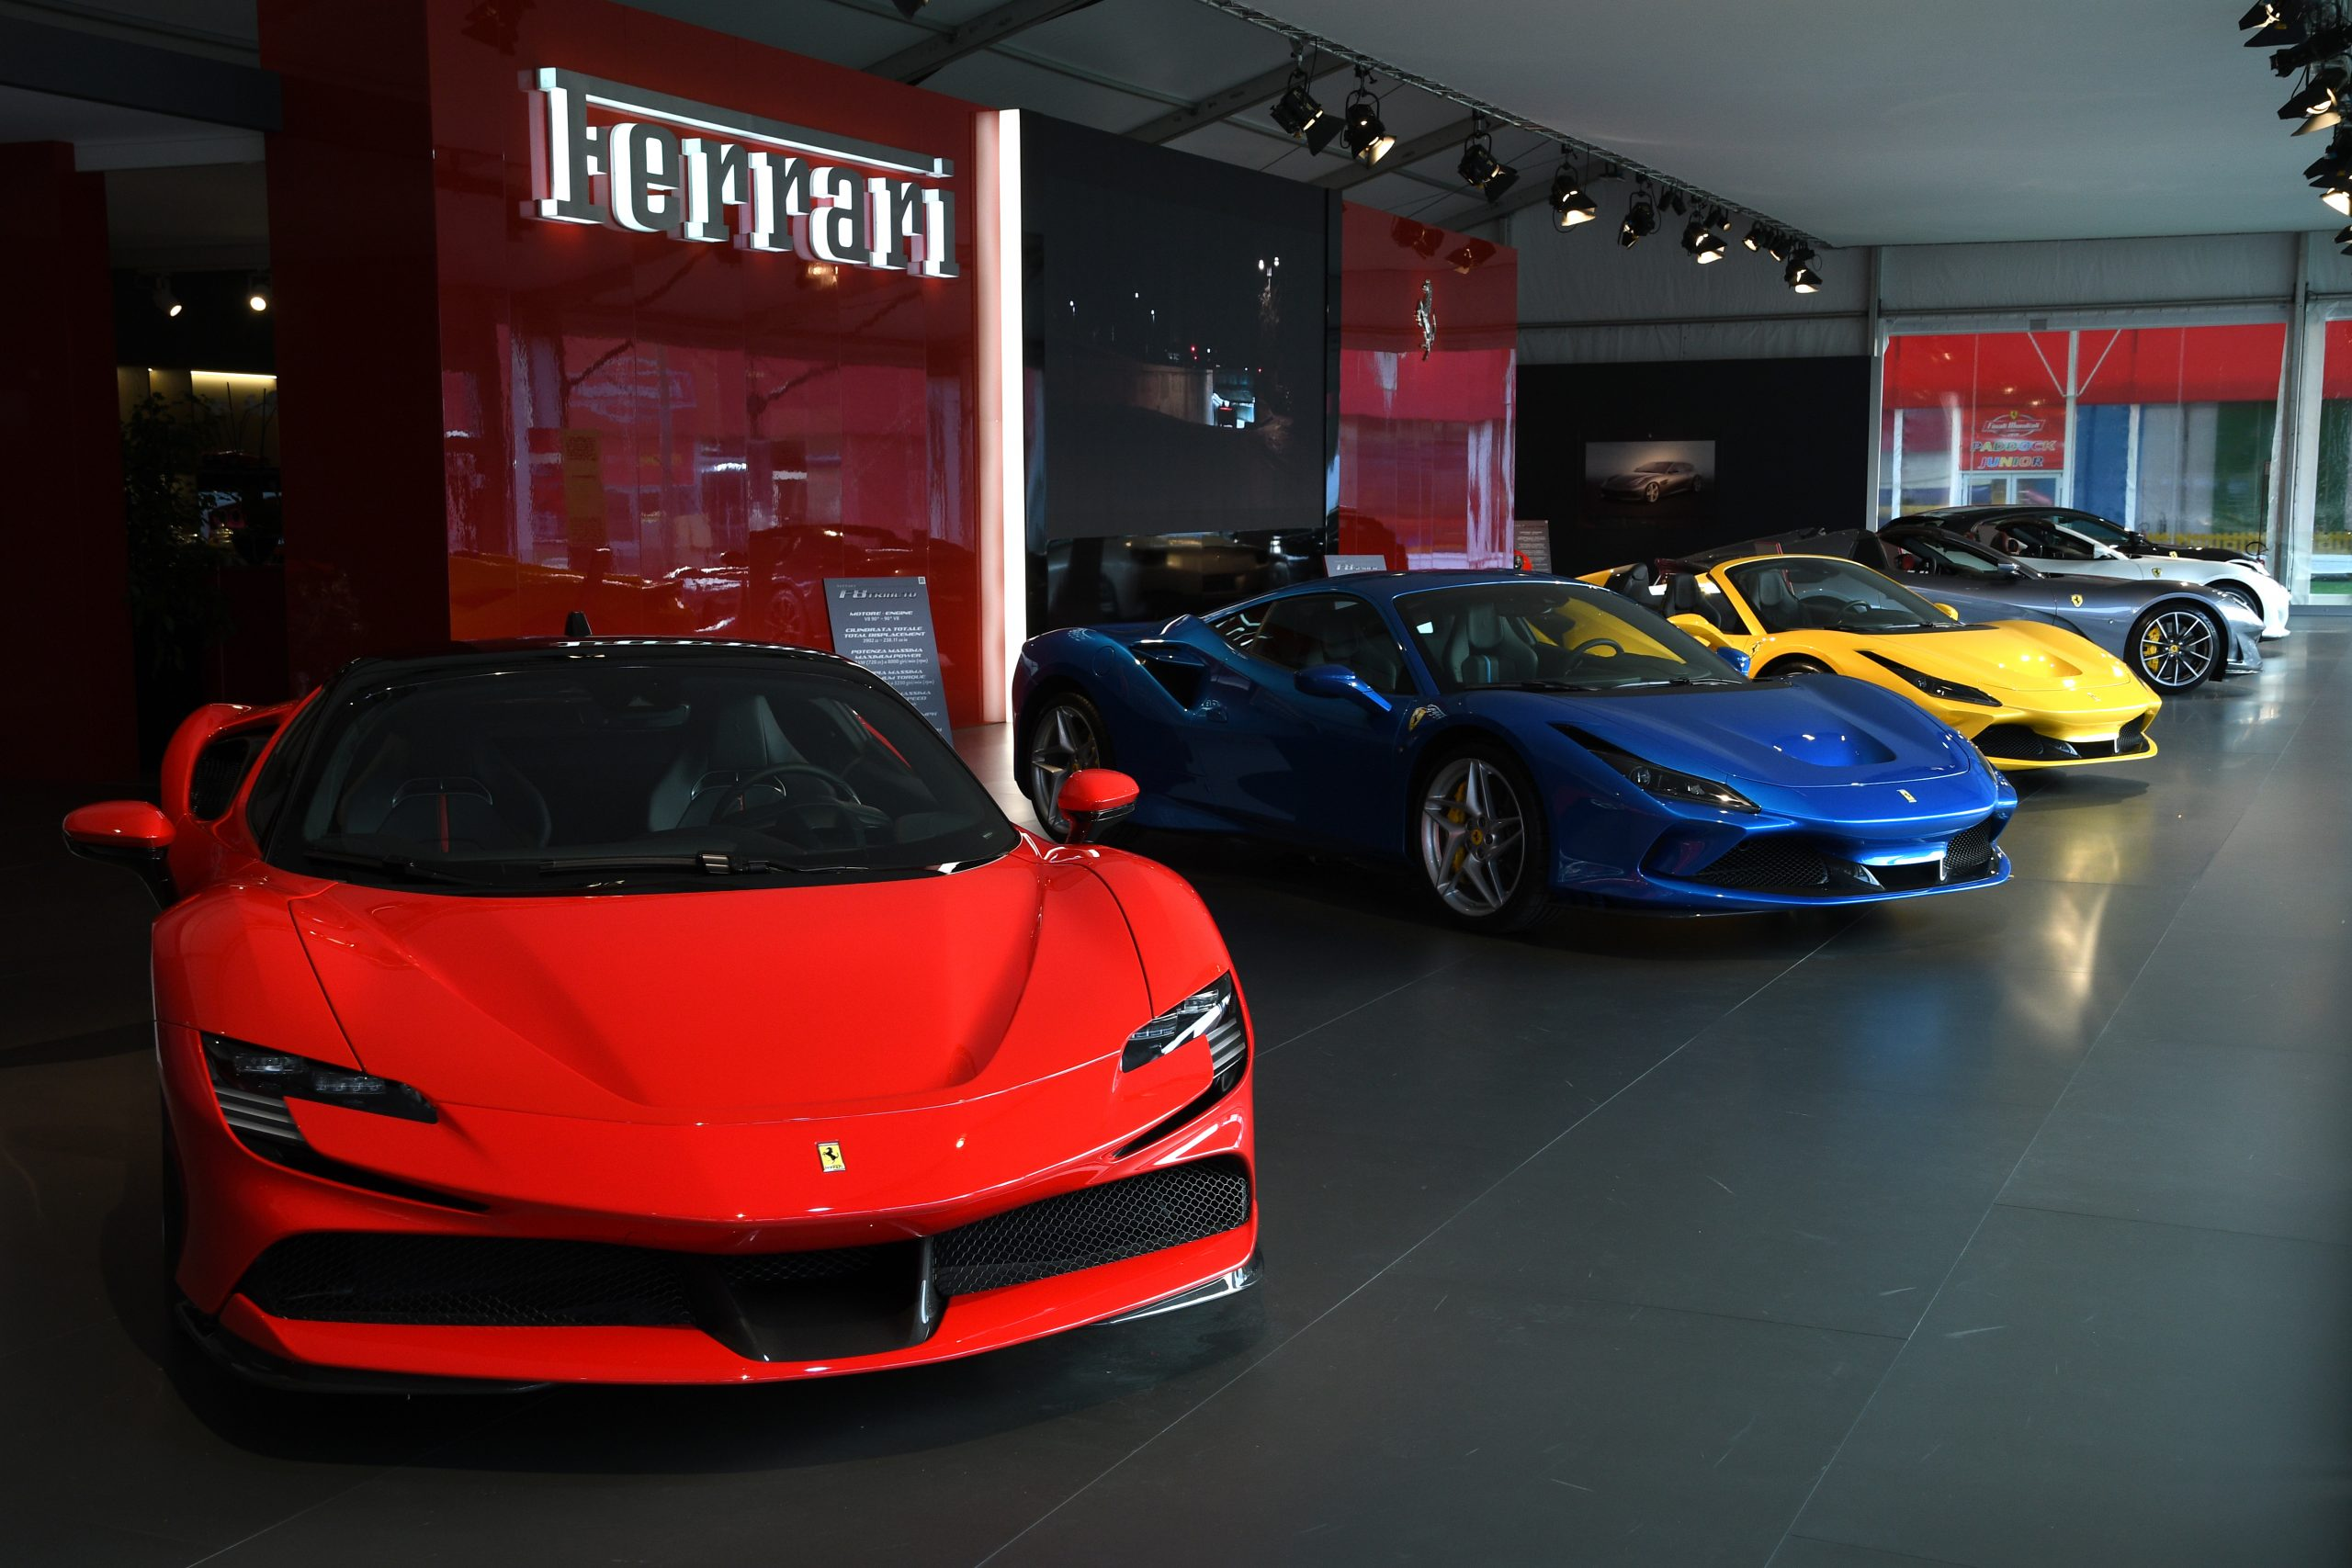 FOTO: Shutterstock / Ferrari SF90 Stradale